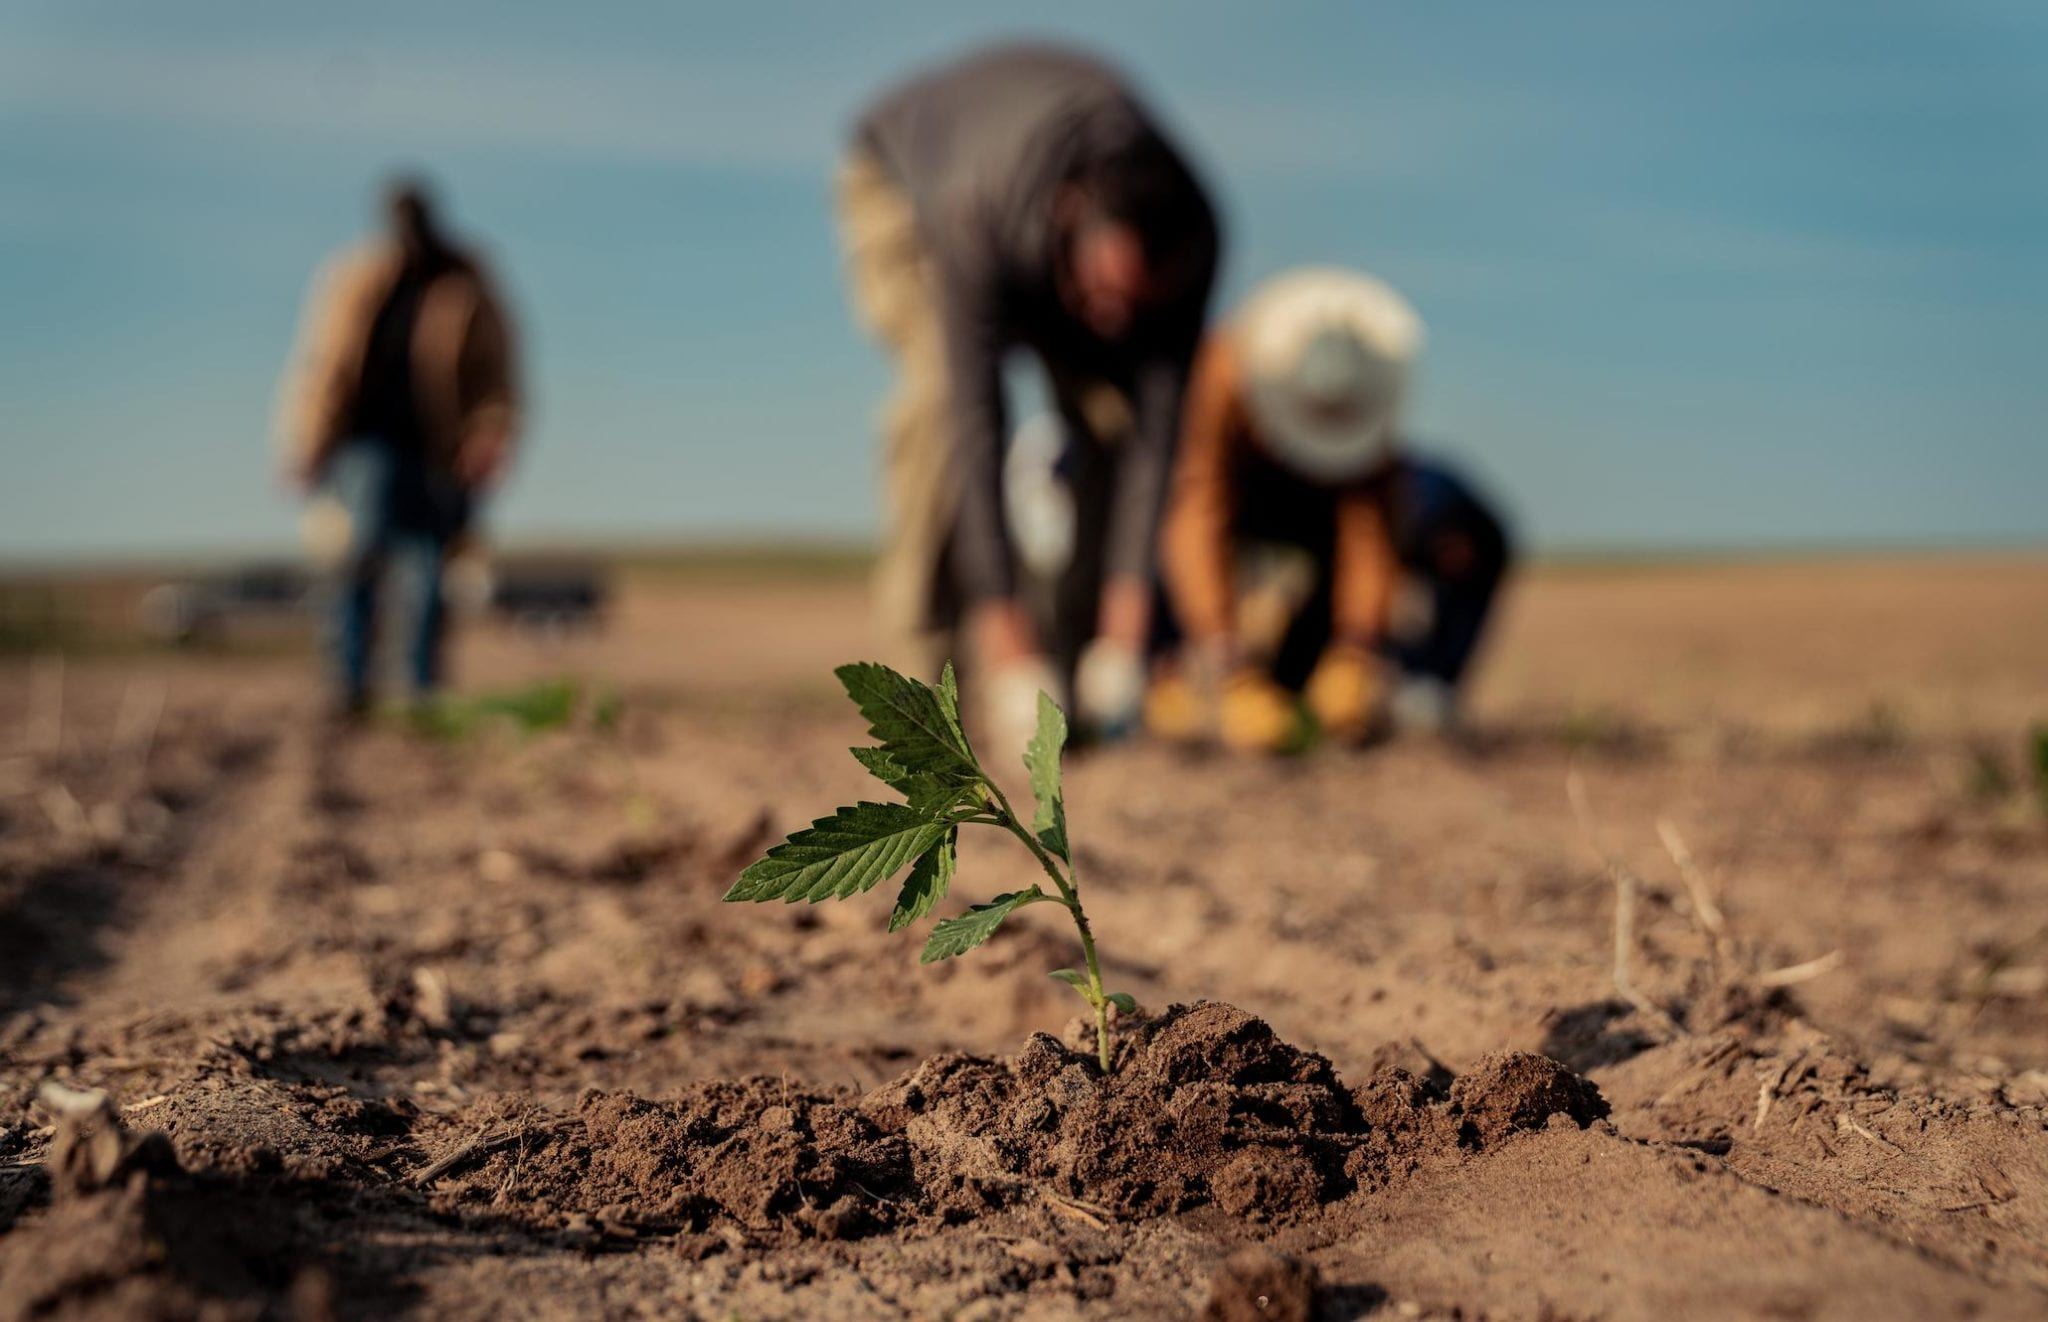 Health Canada opens up CBD market with new hemp cultivar approvals